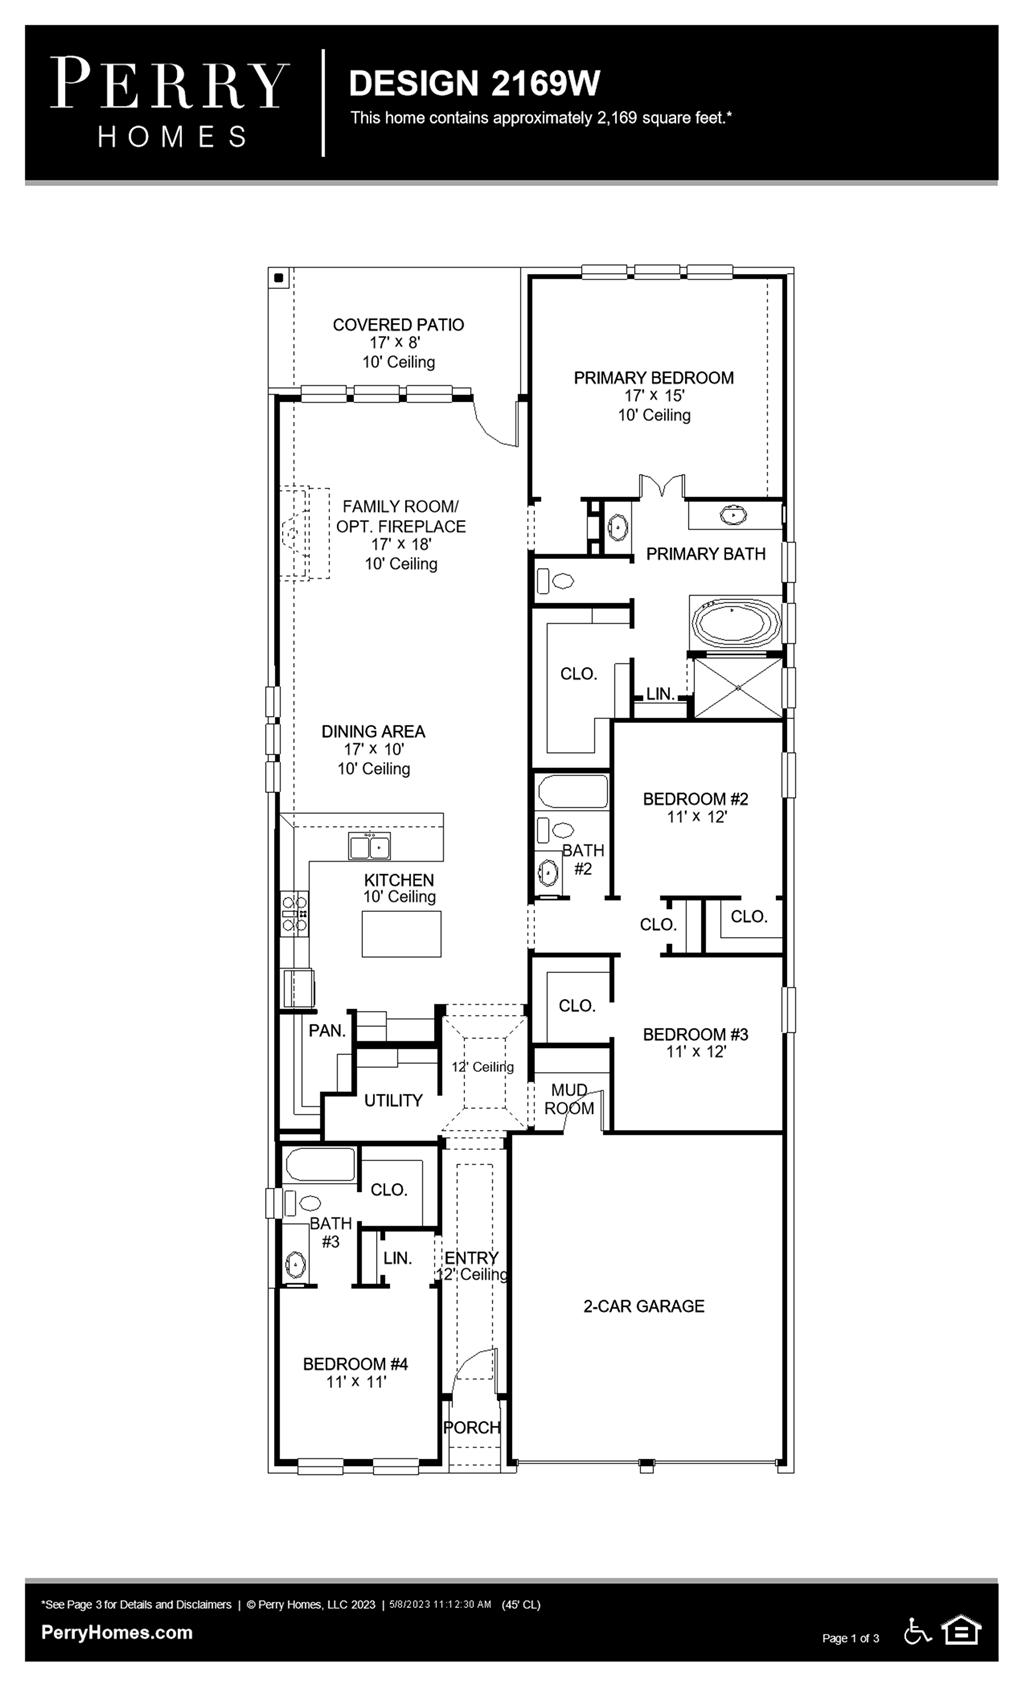 Floor Plan for 2169W